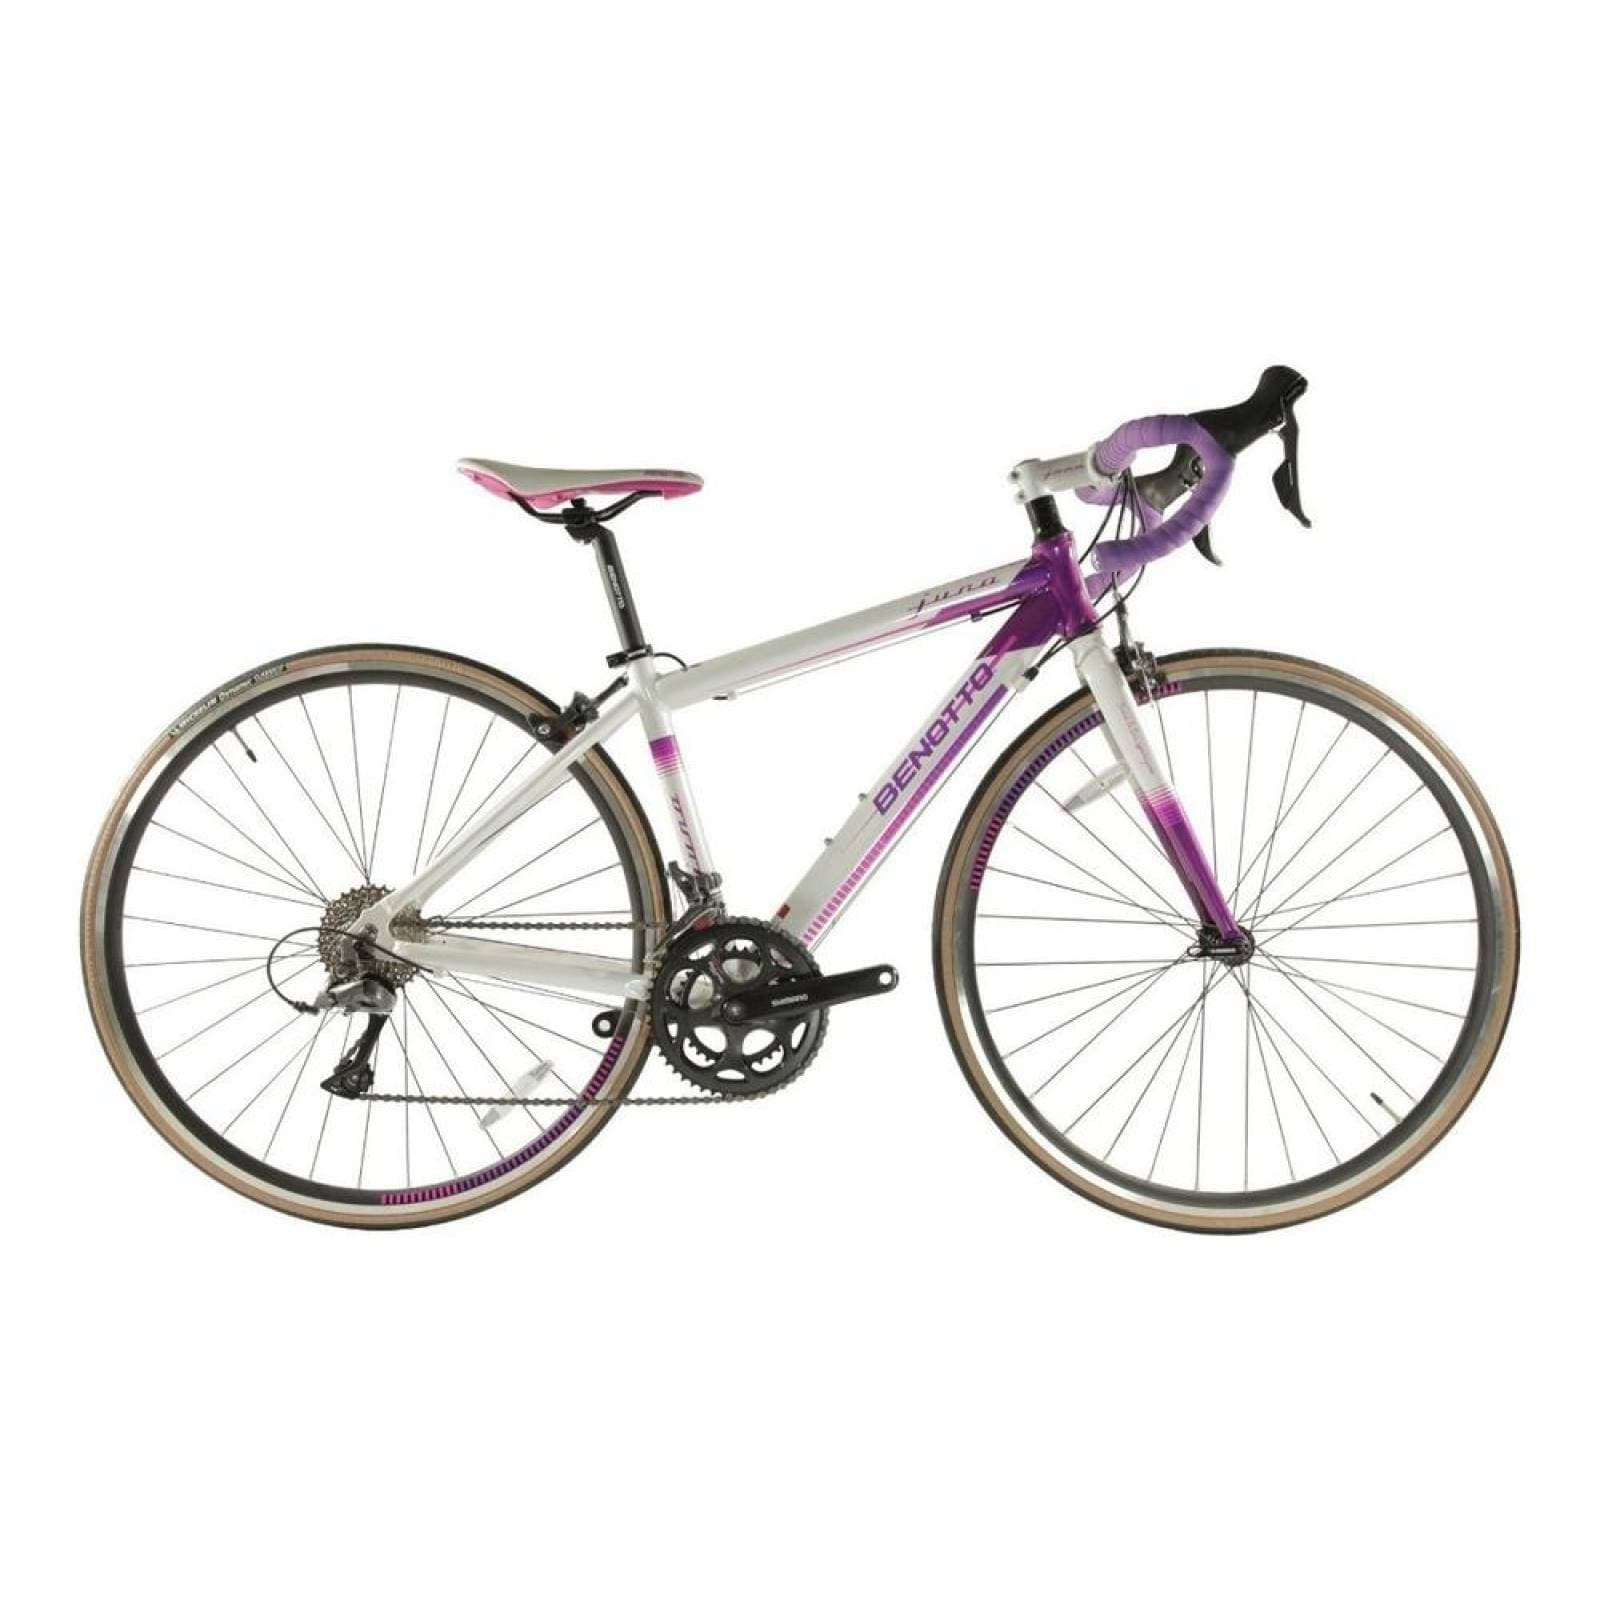 Bicicleta Benotto Ruta Juno R700c 16v Shimano Claris Alumini